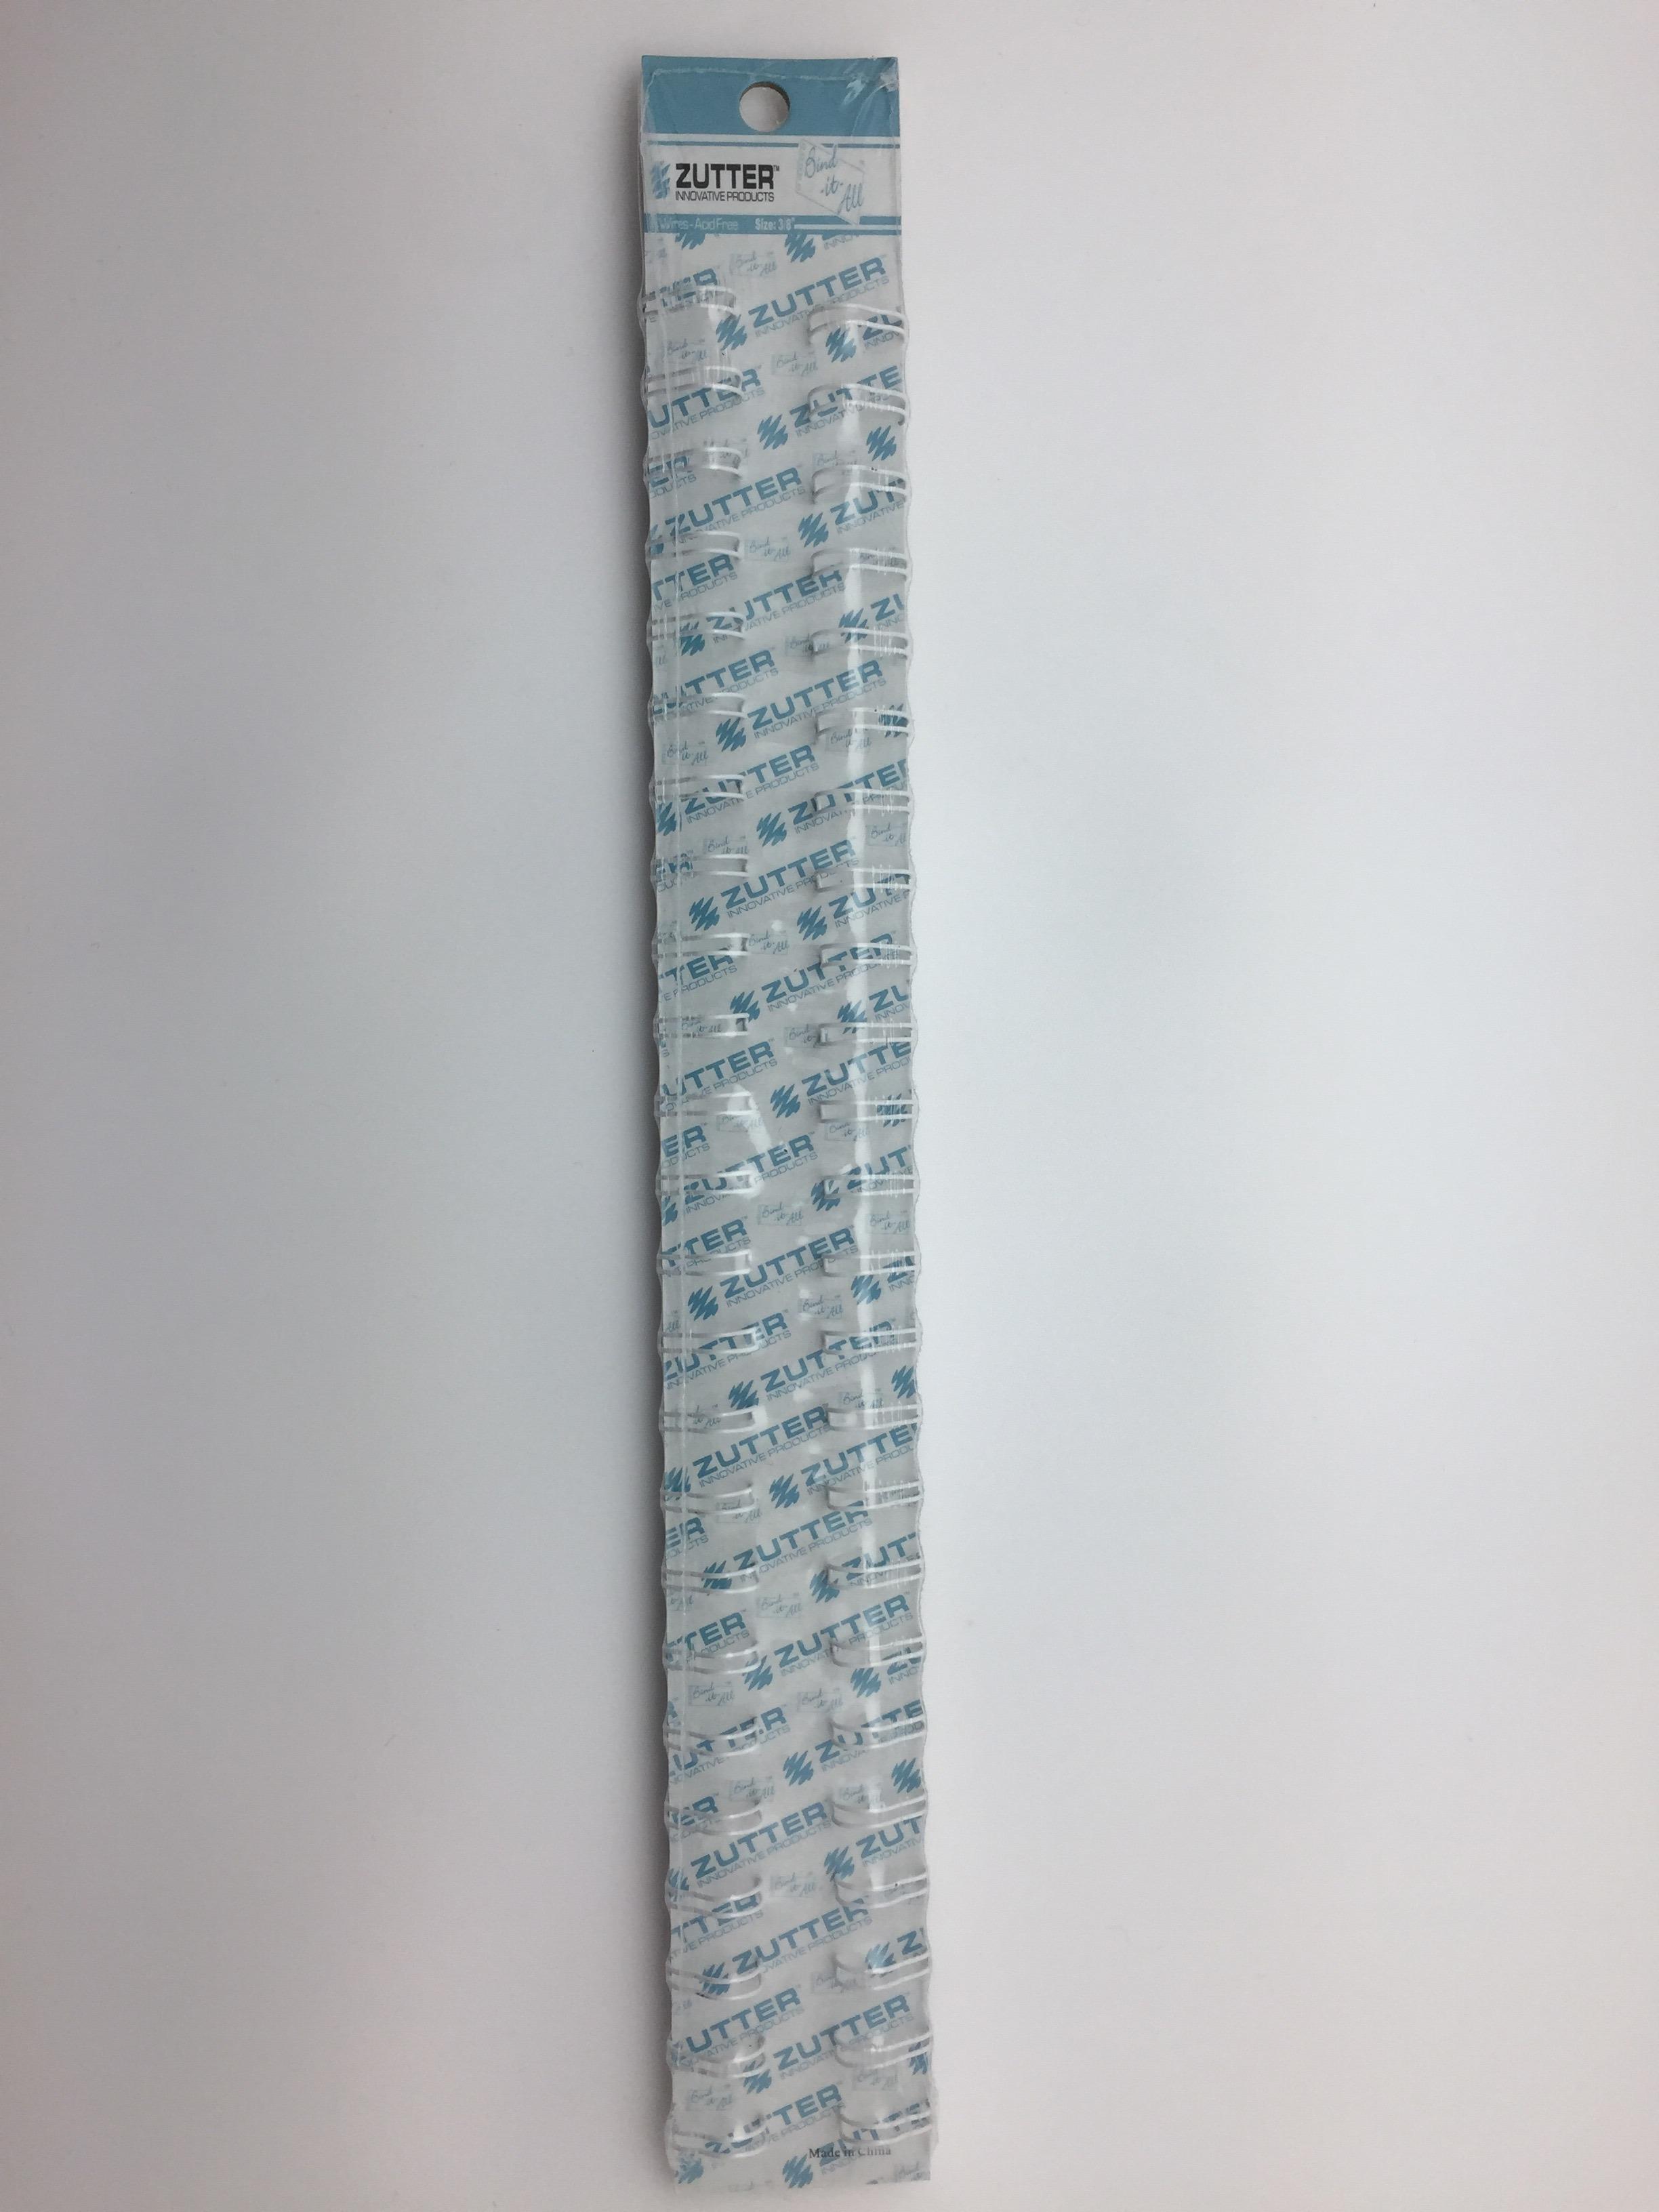 Zutter-Bind-It-All-Wire-White-3-8-inch